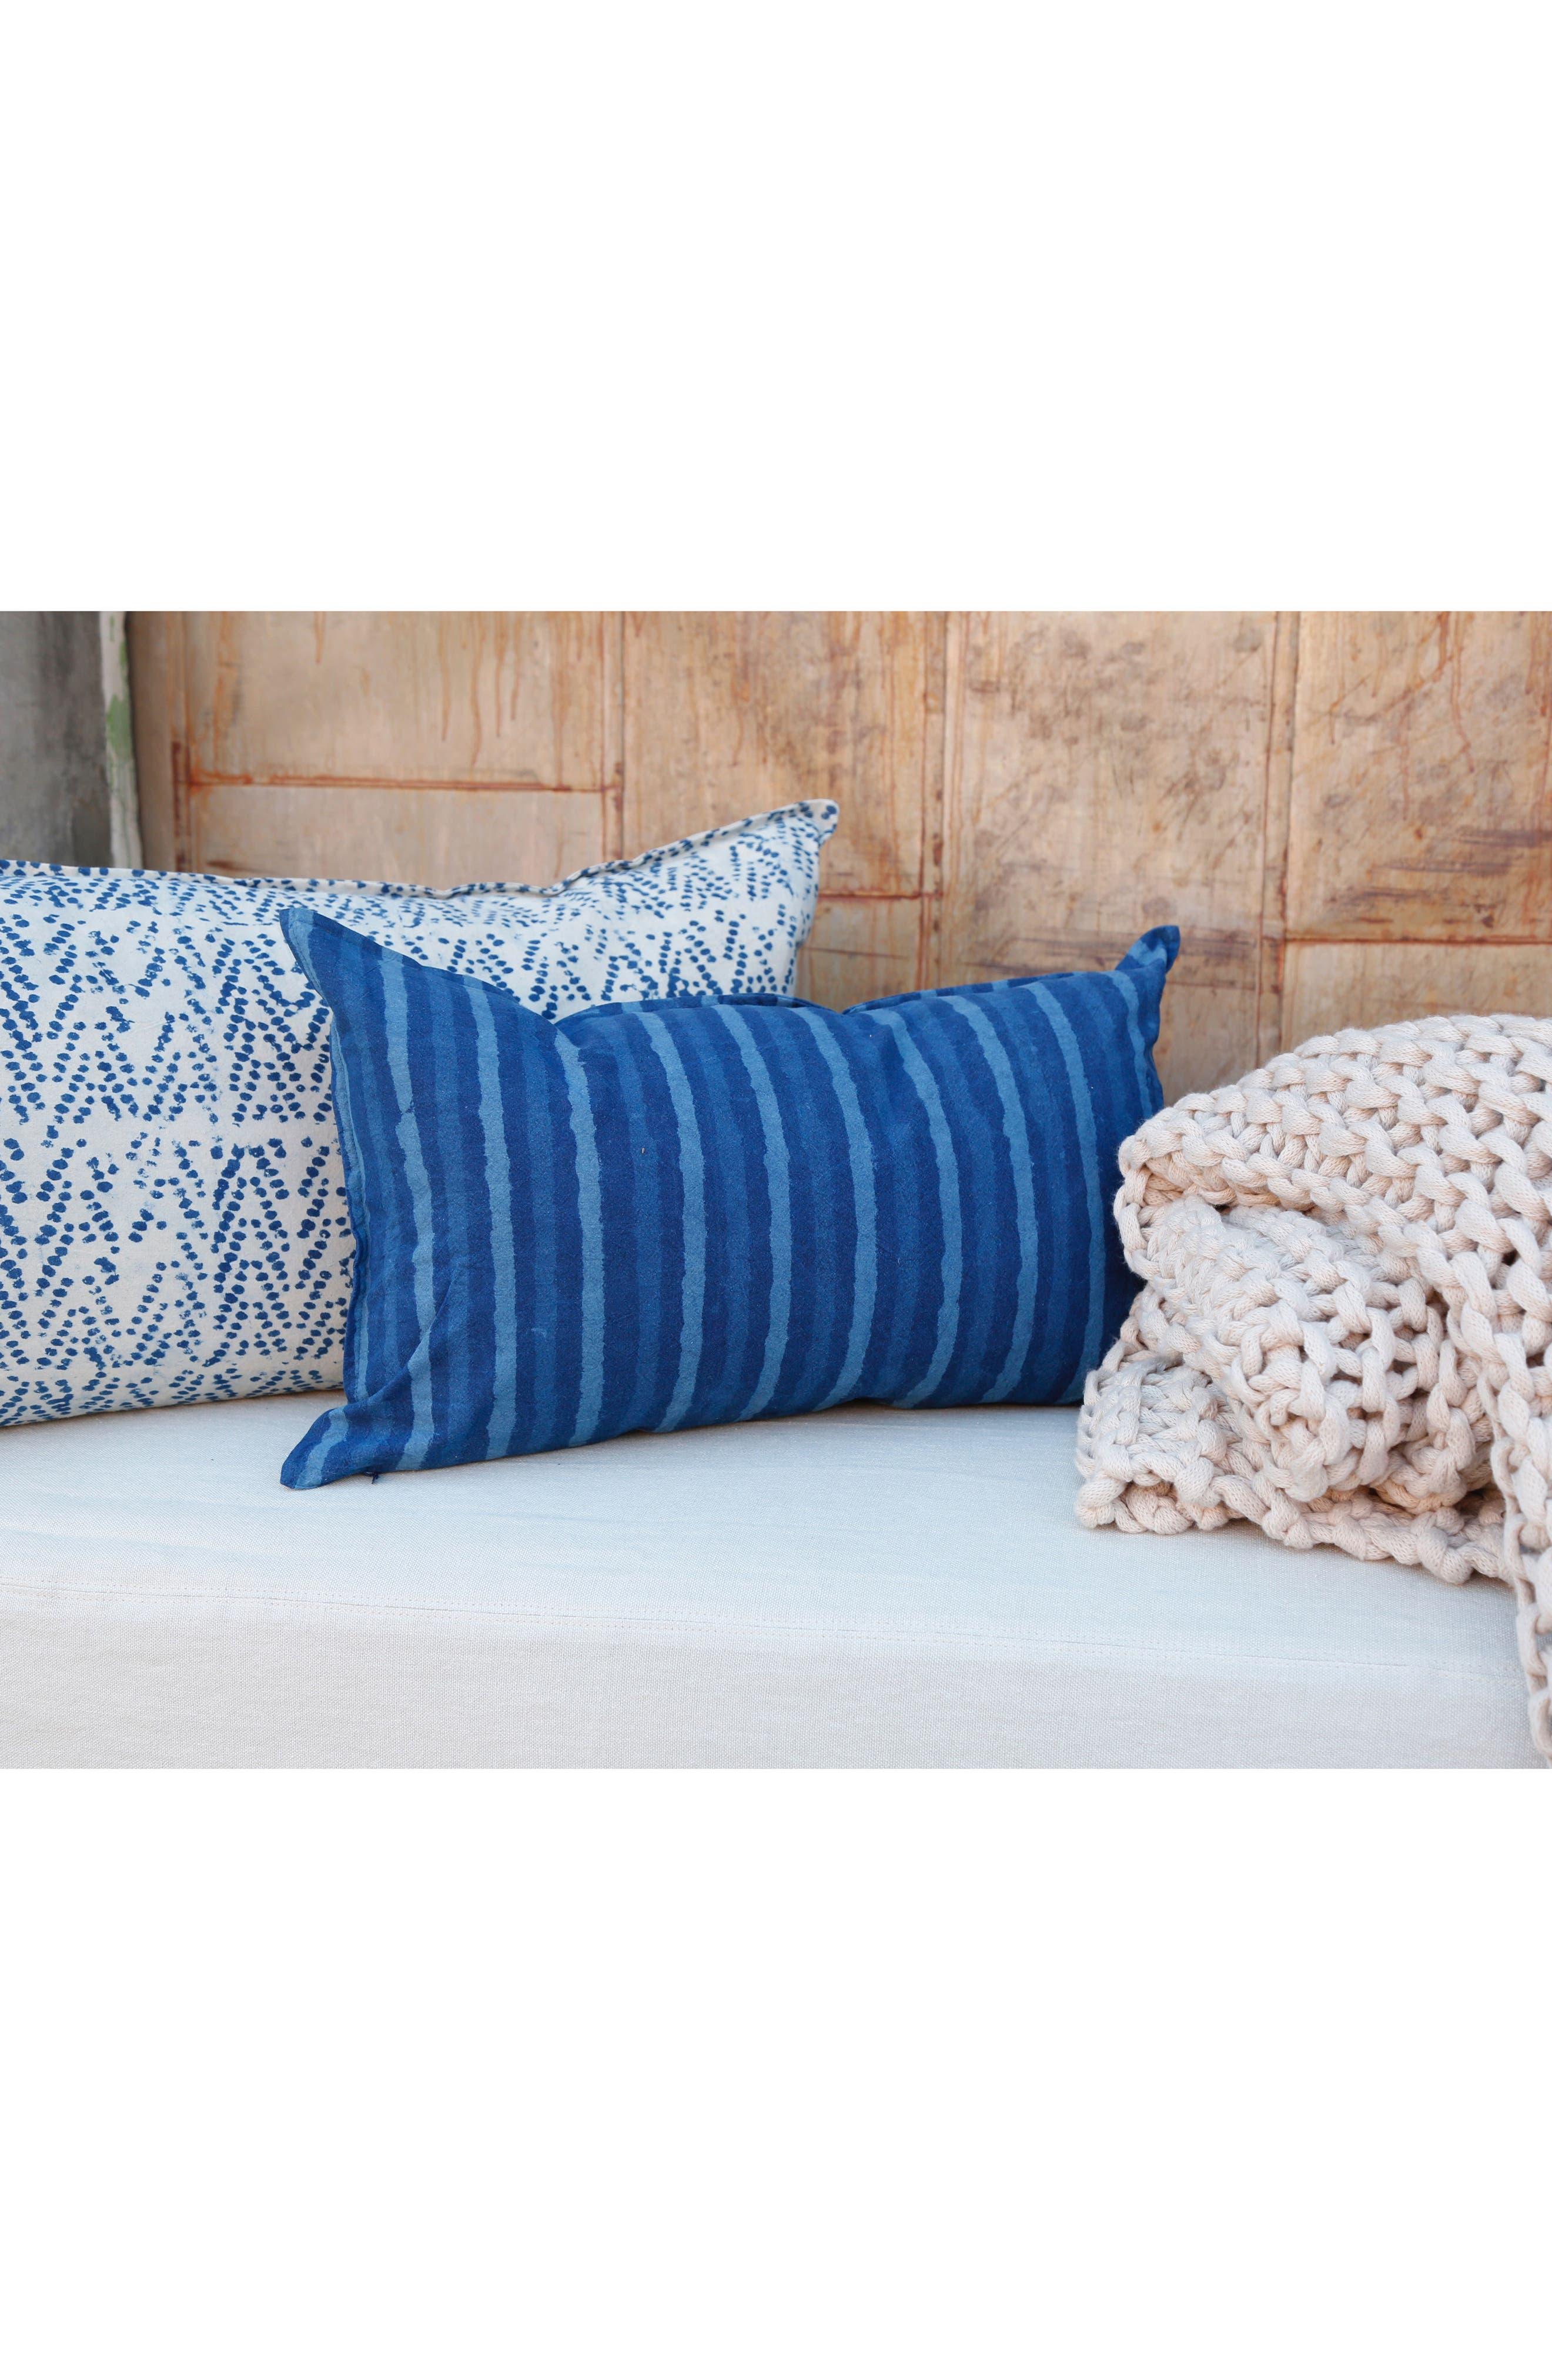 Indigo Dots Accent Pillow,                             Alternate thumbnail 2, color,                             Blue Multi